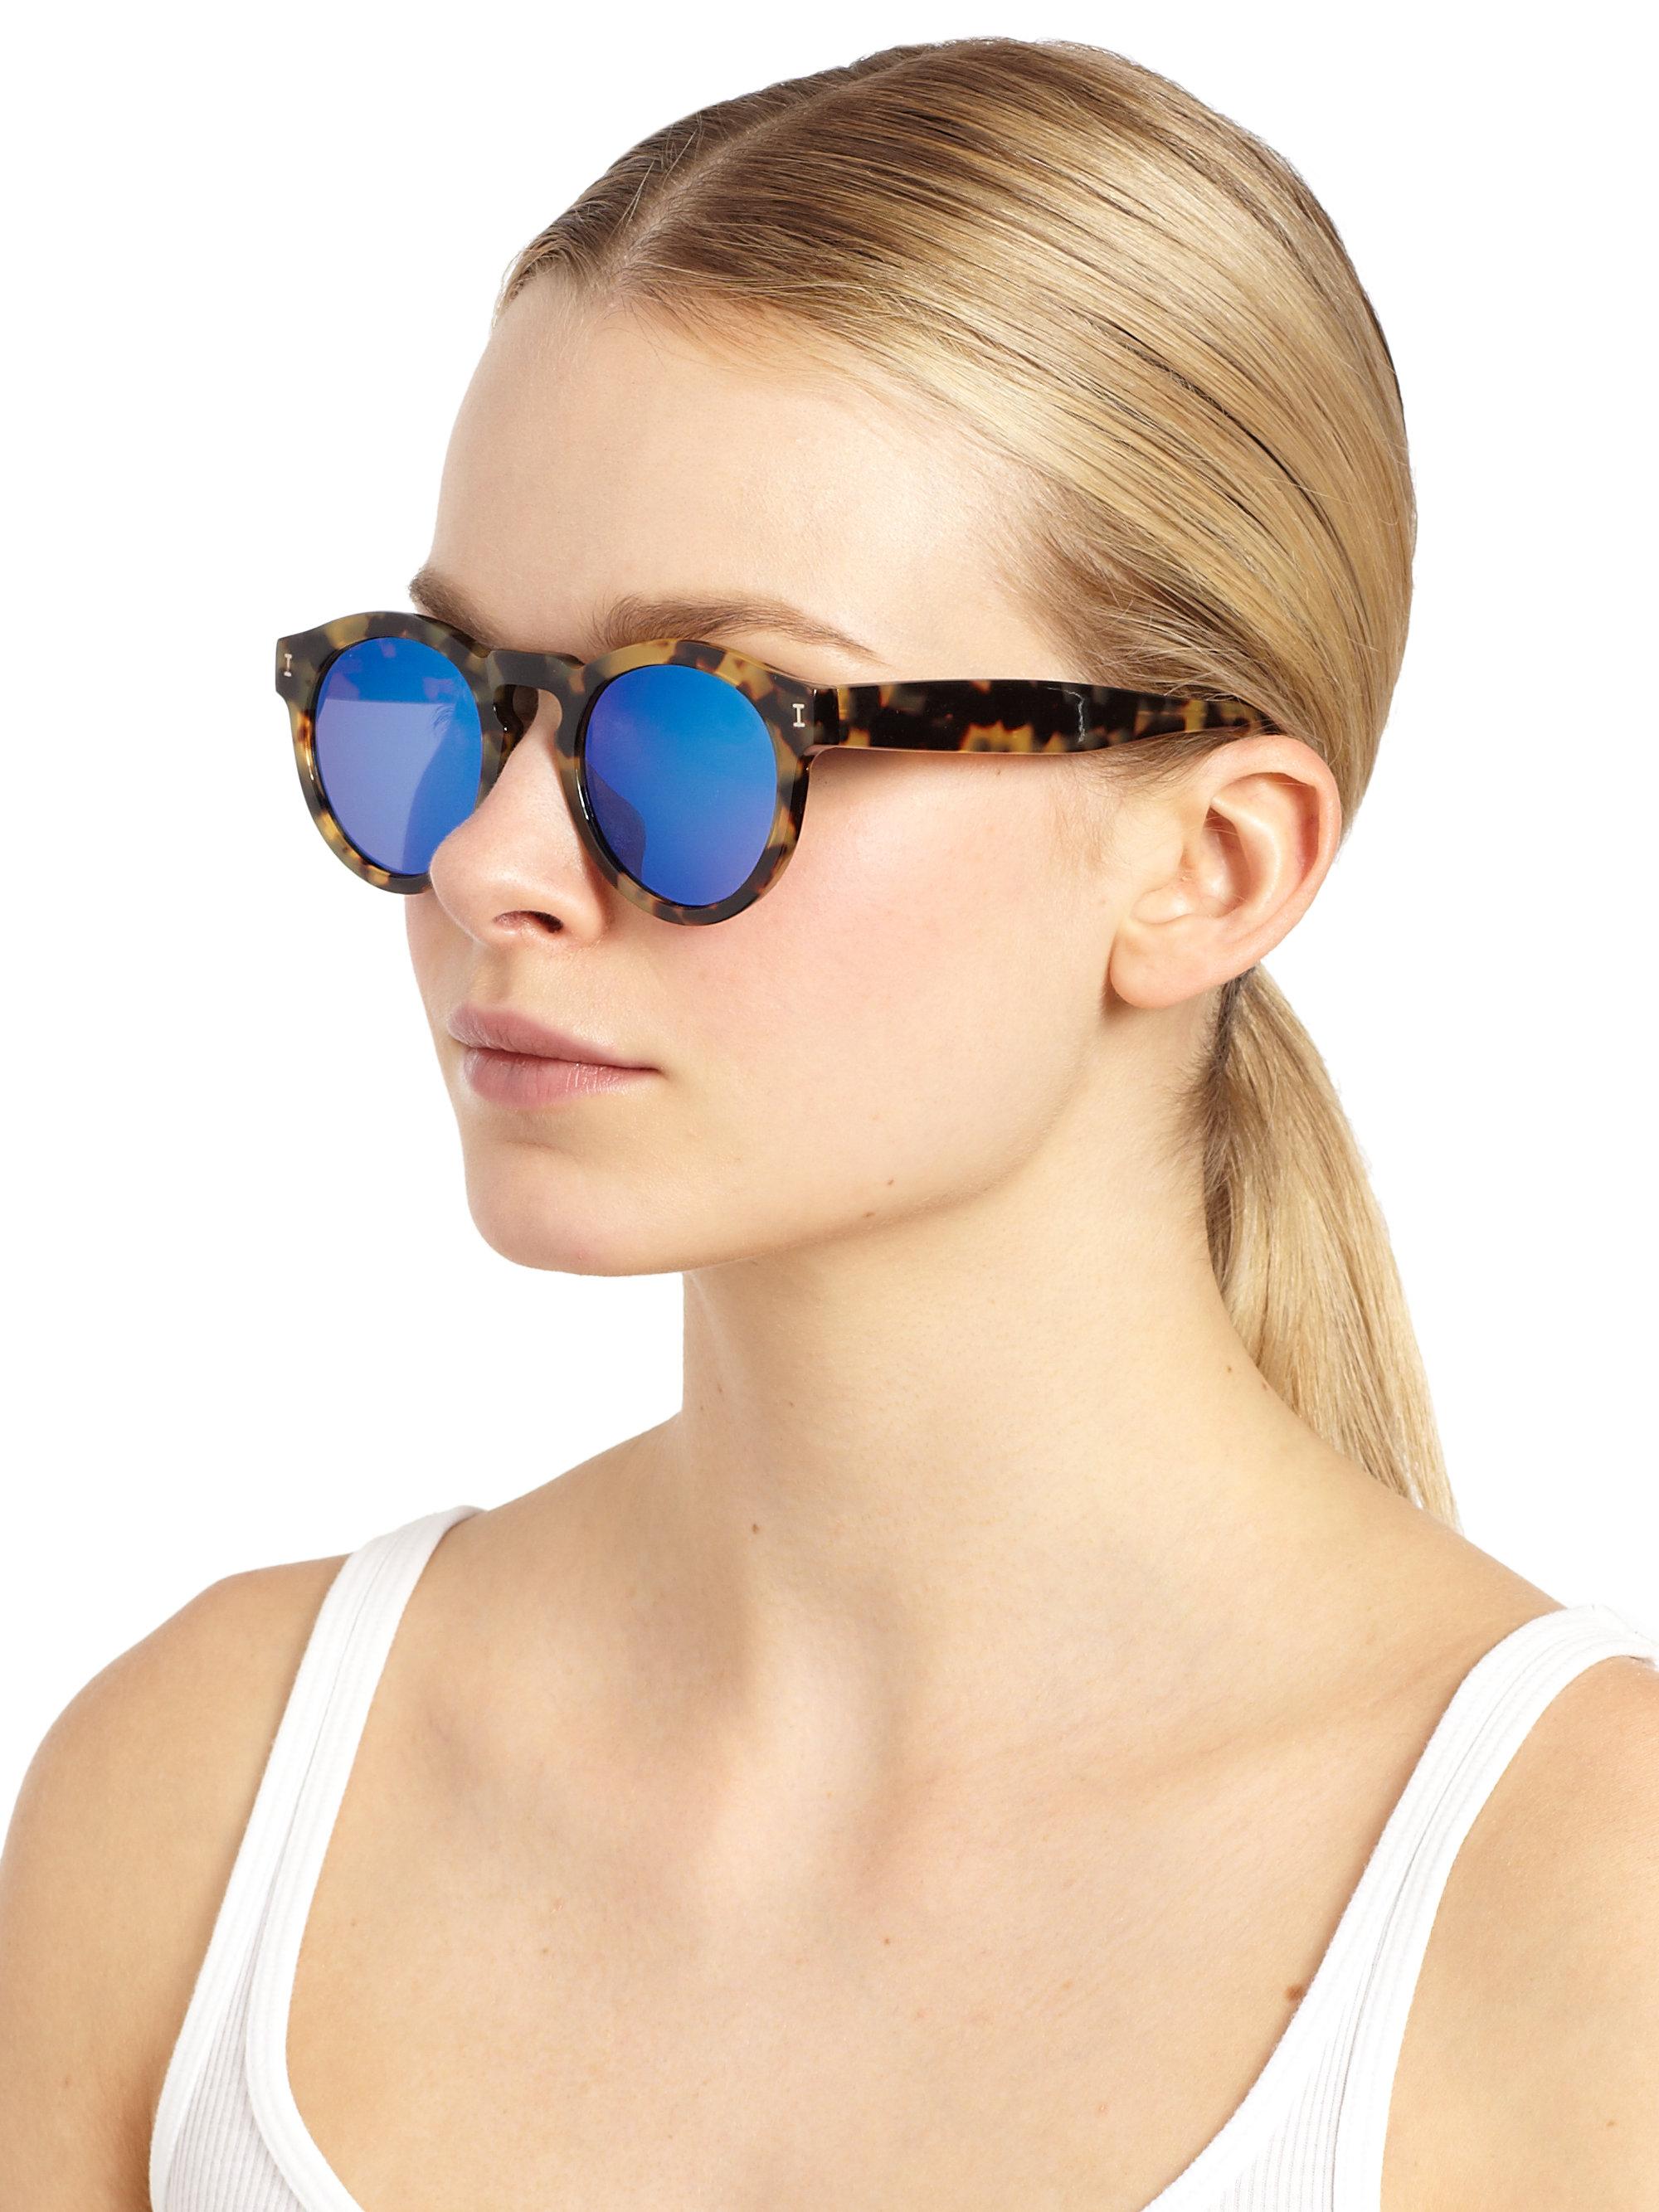 745091c0f06 Illesteva Leonard Tortoise Mirrored 48mm Round Sunglasses in Brown